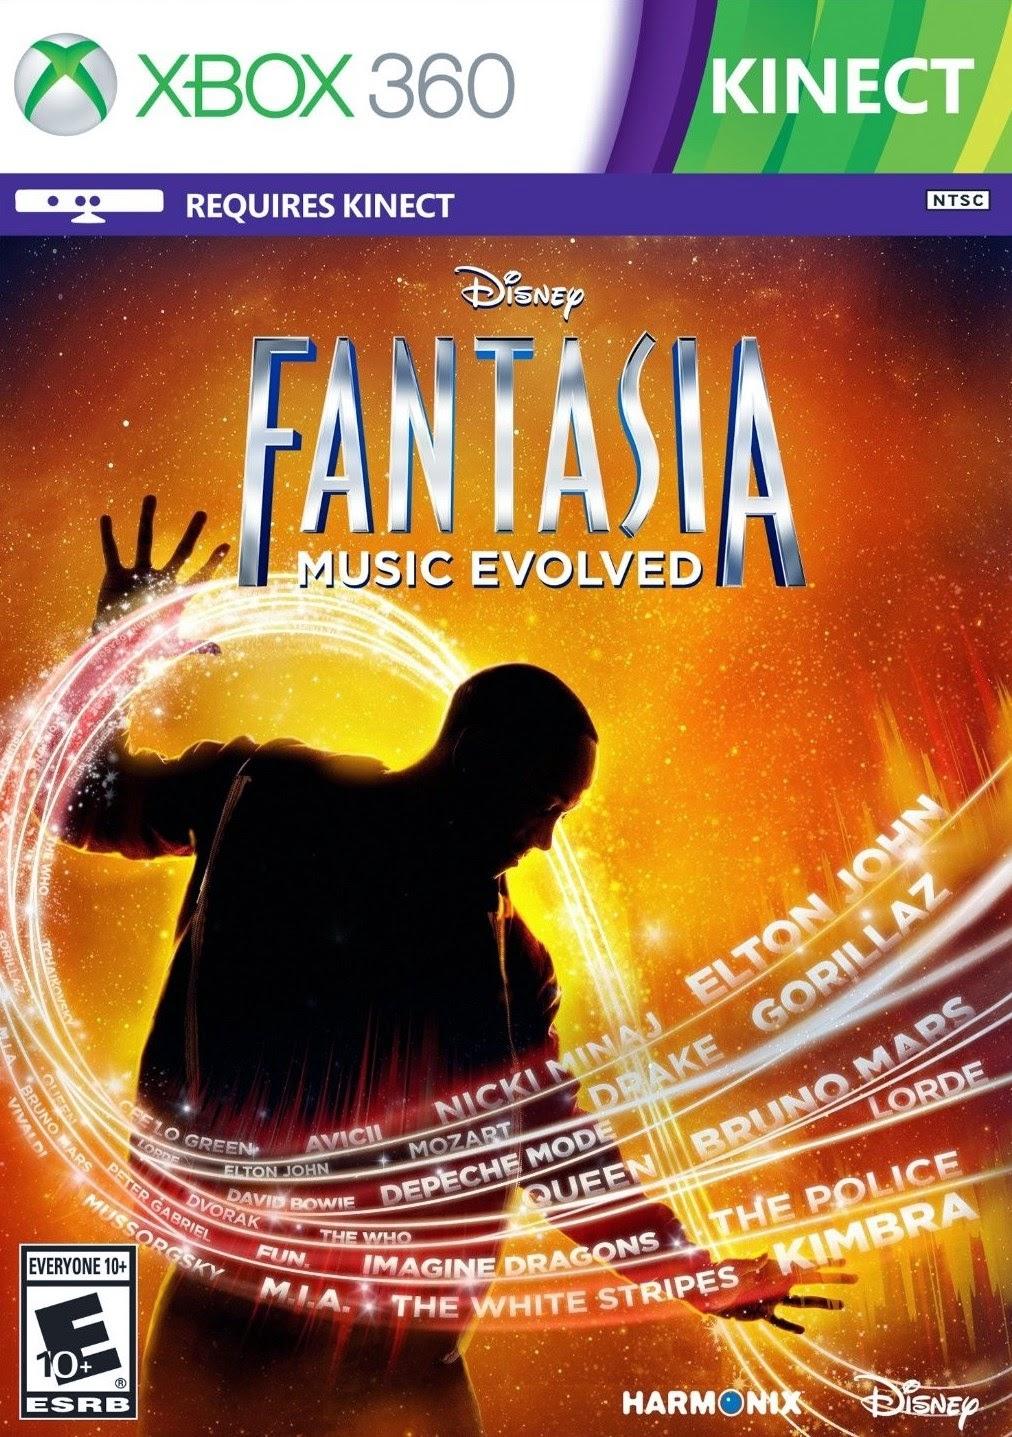 Disney Fantasia Music Evolved XBOX 360 Cover Caratula